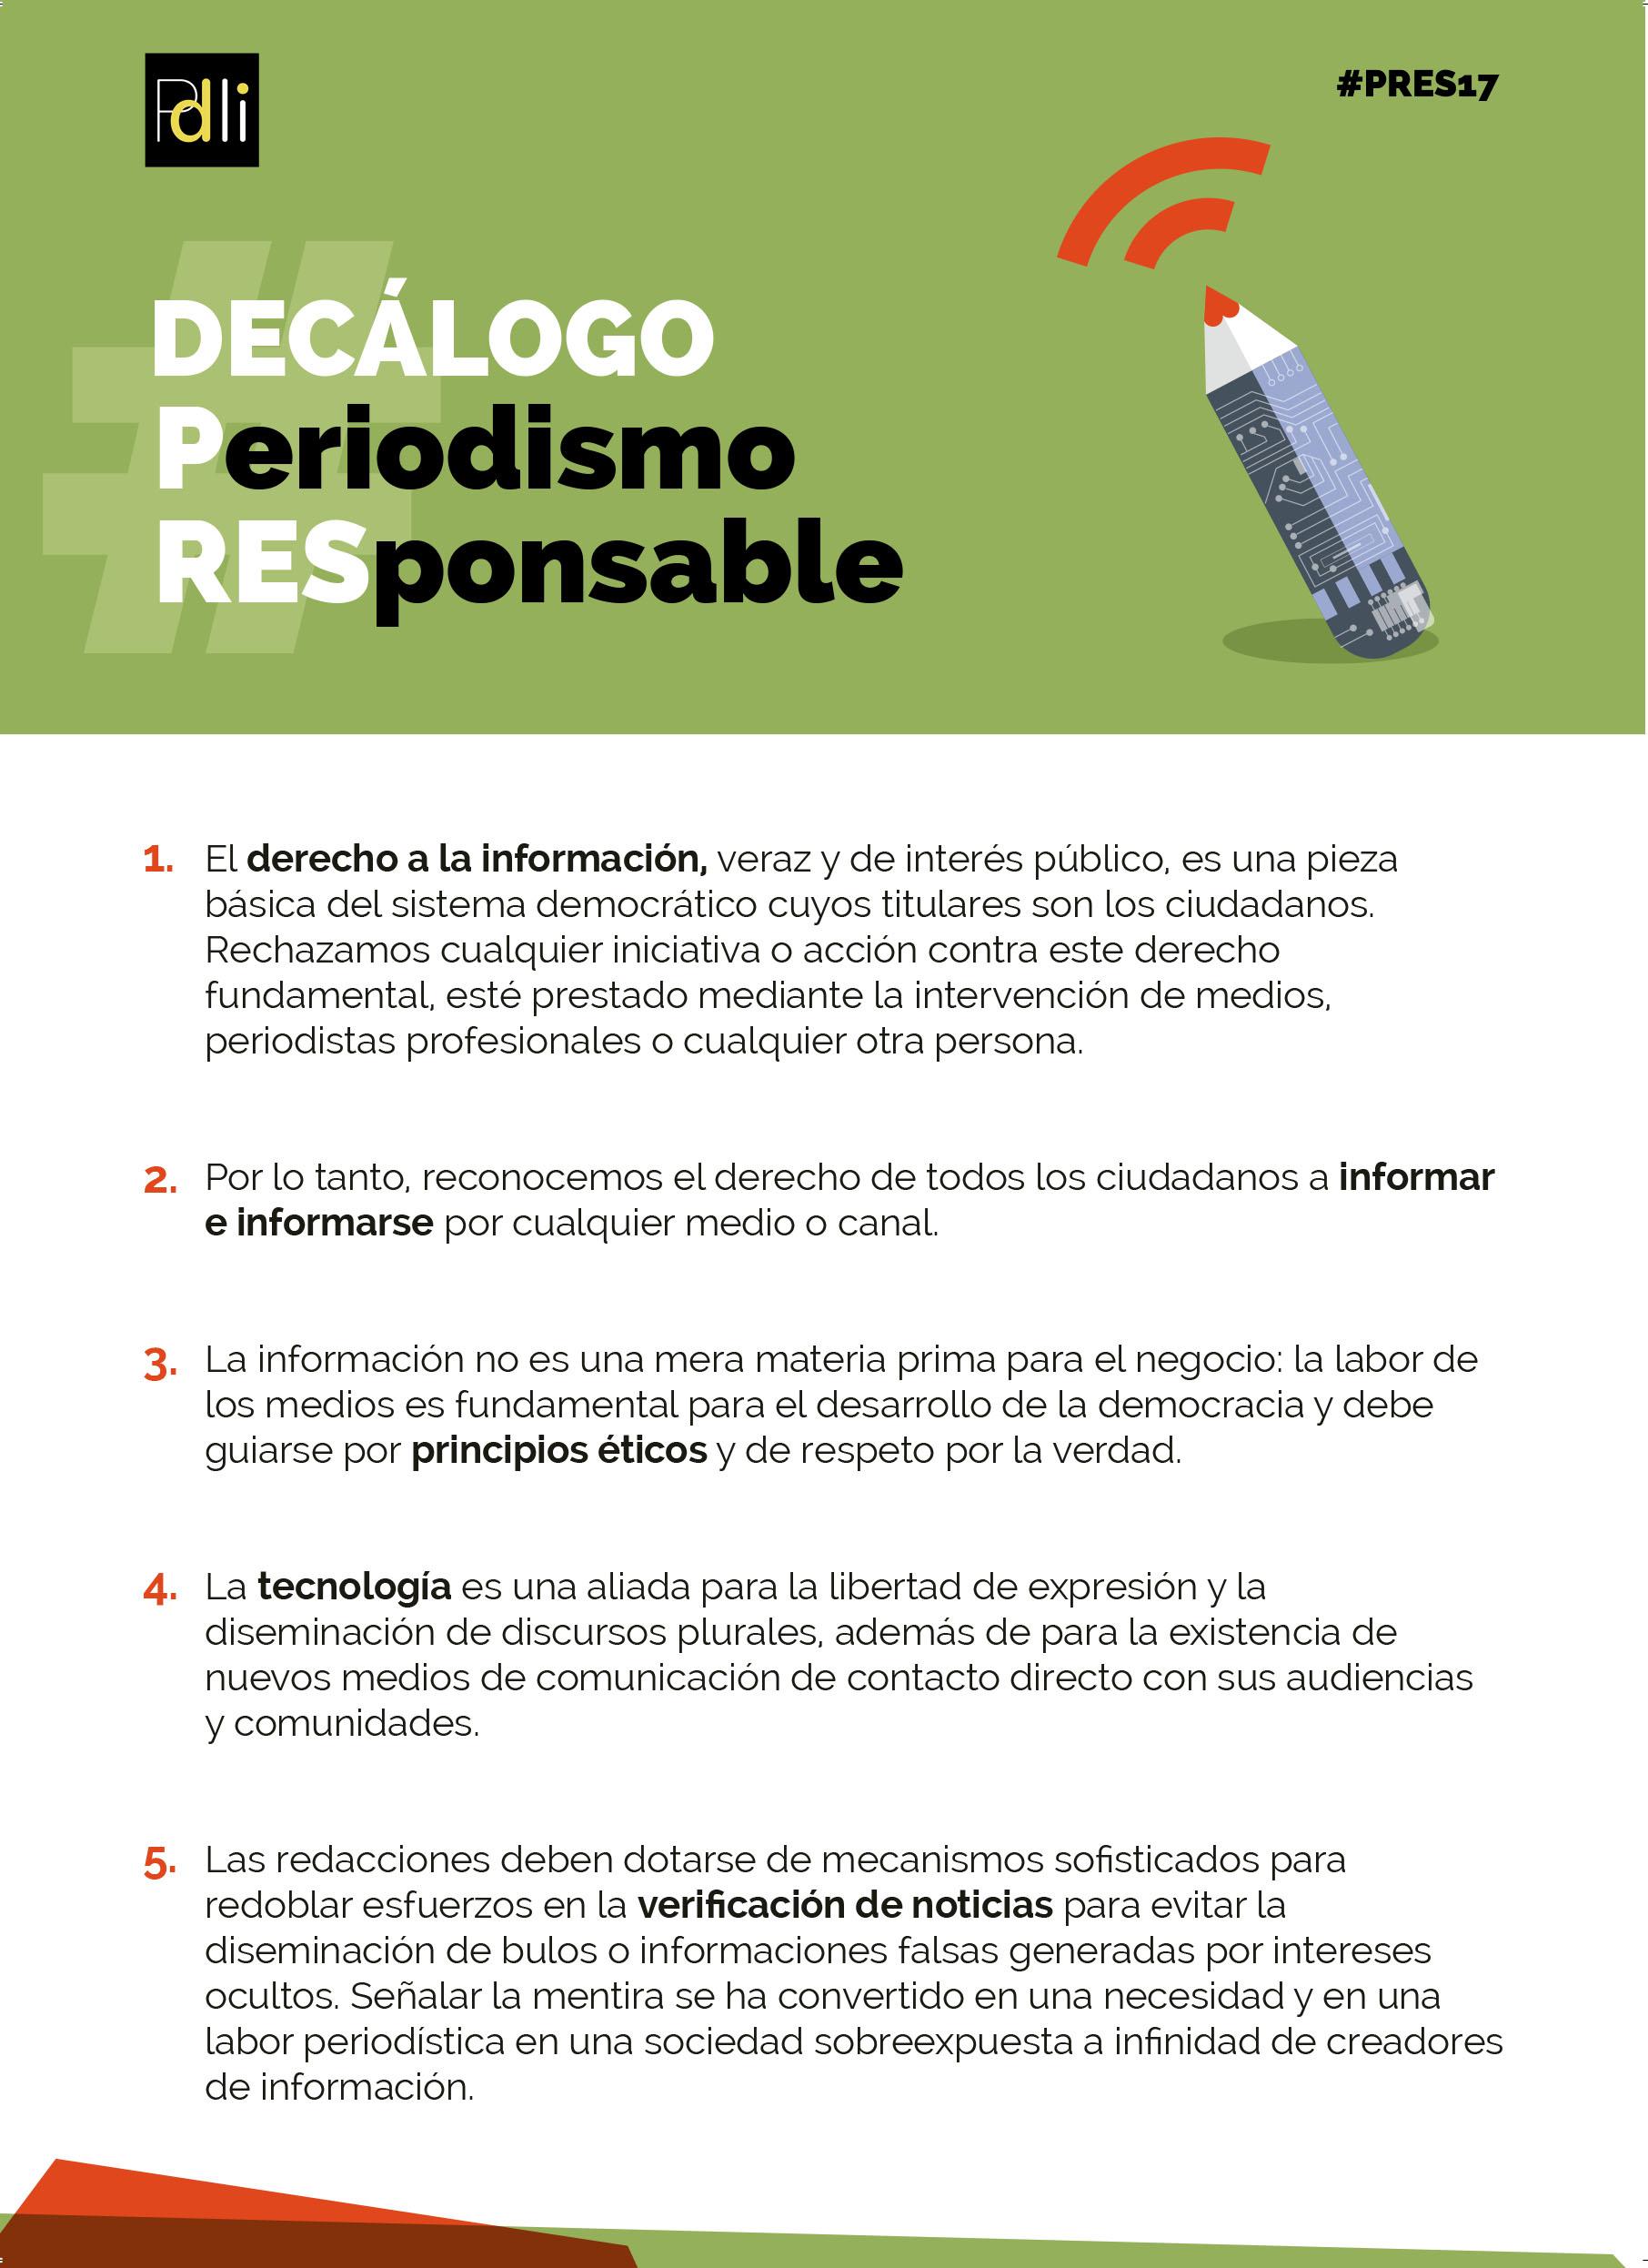 periodismoResponsable_decálogo